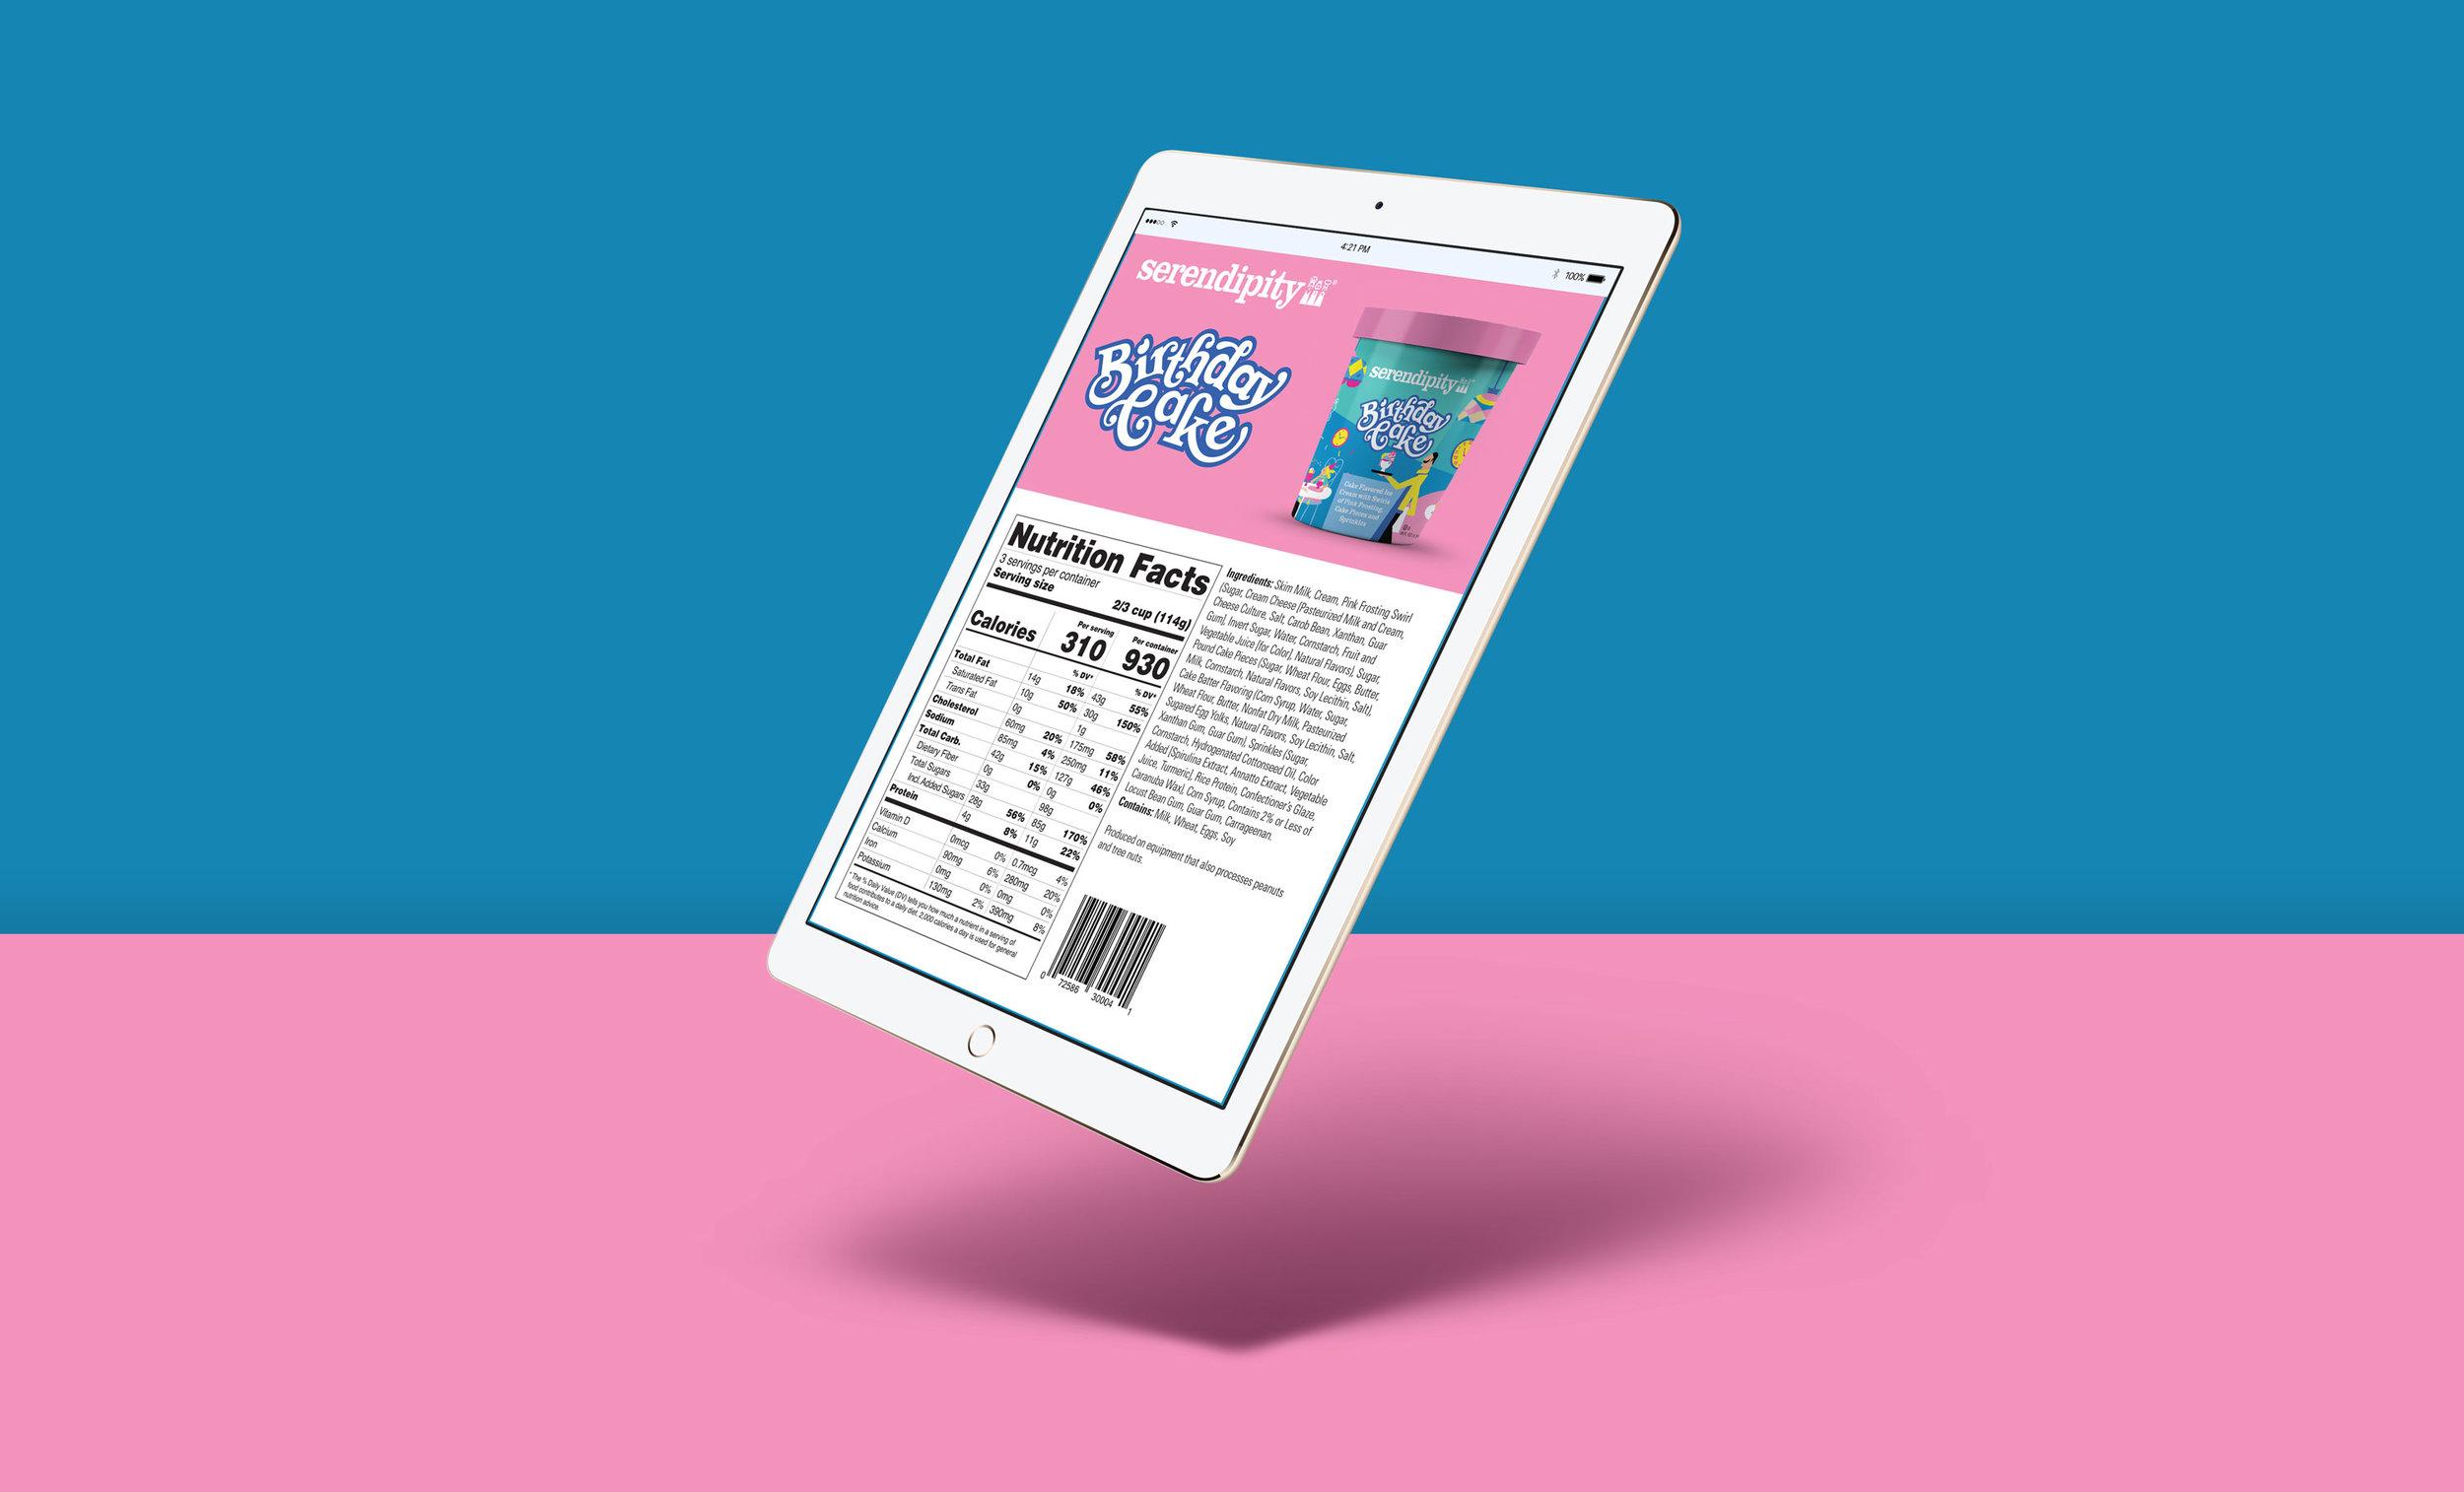 James-Rivas_Serendipity-Ice-Cream_tablet_website.jpg